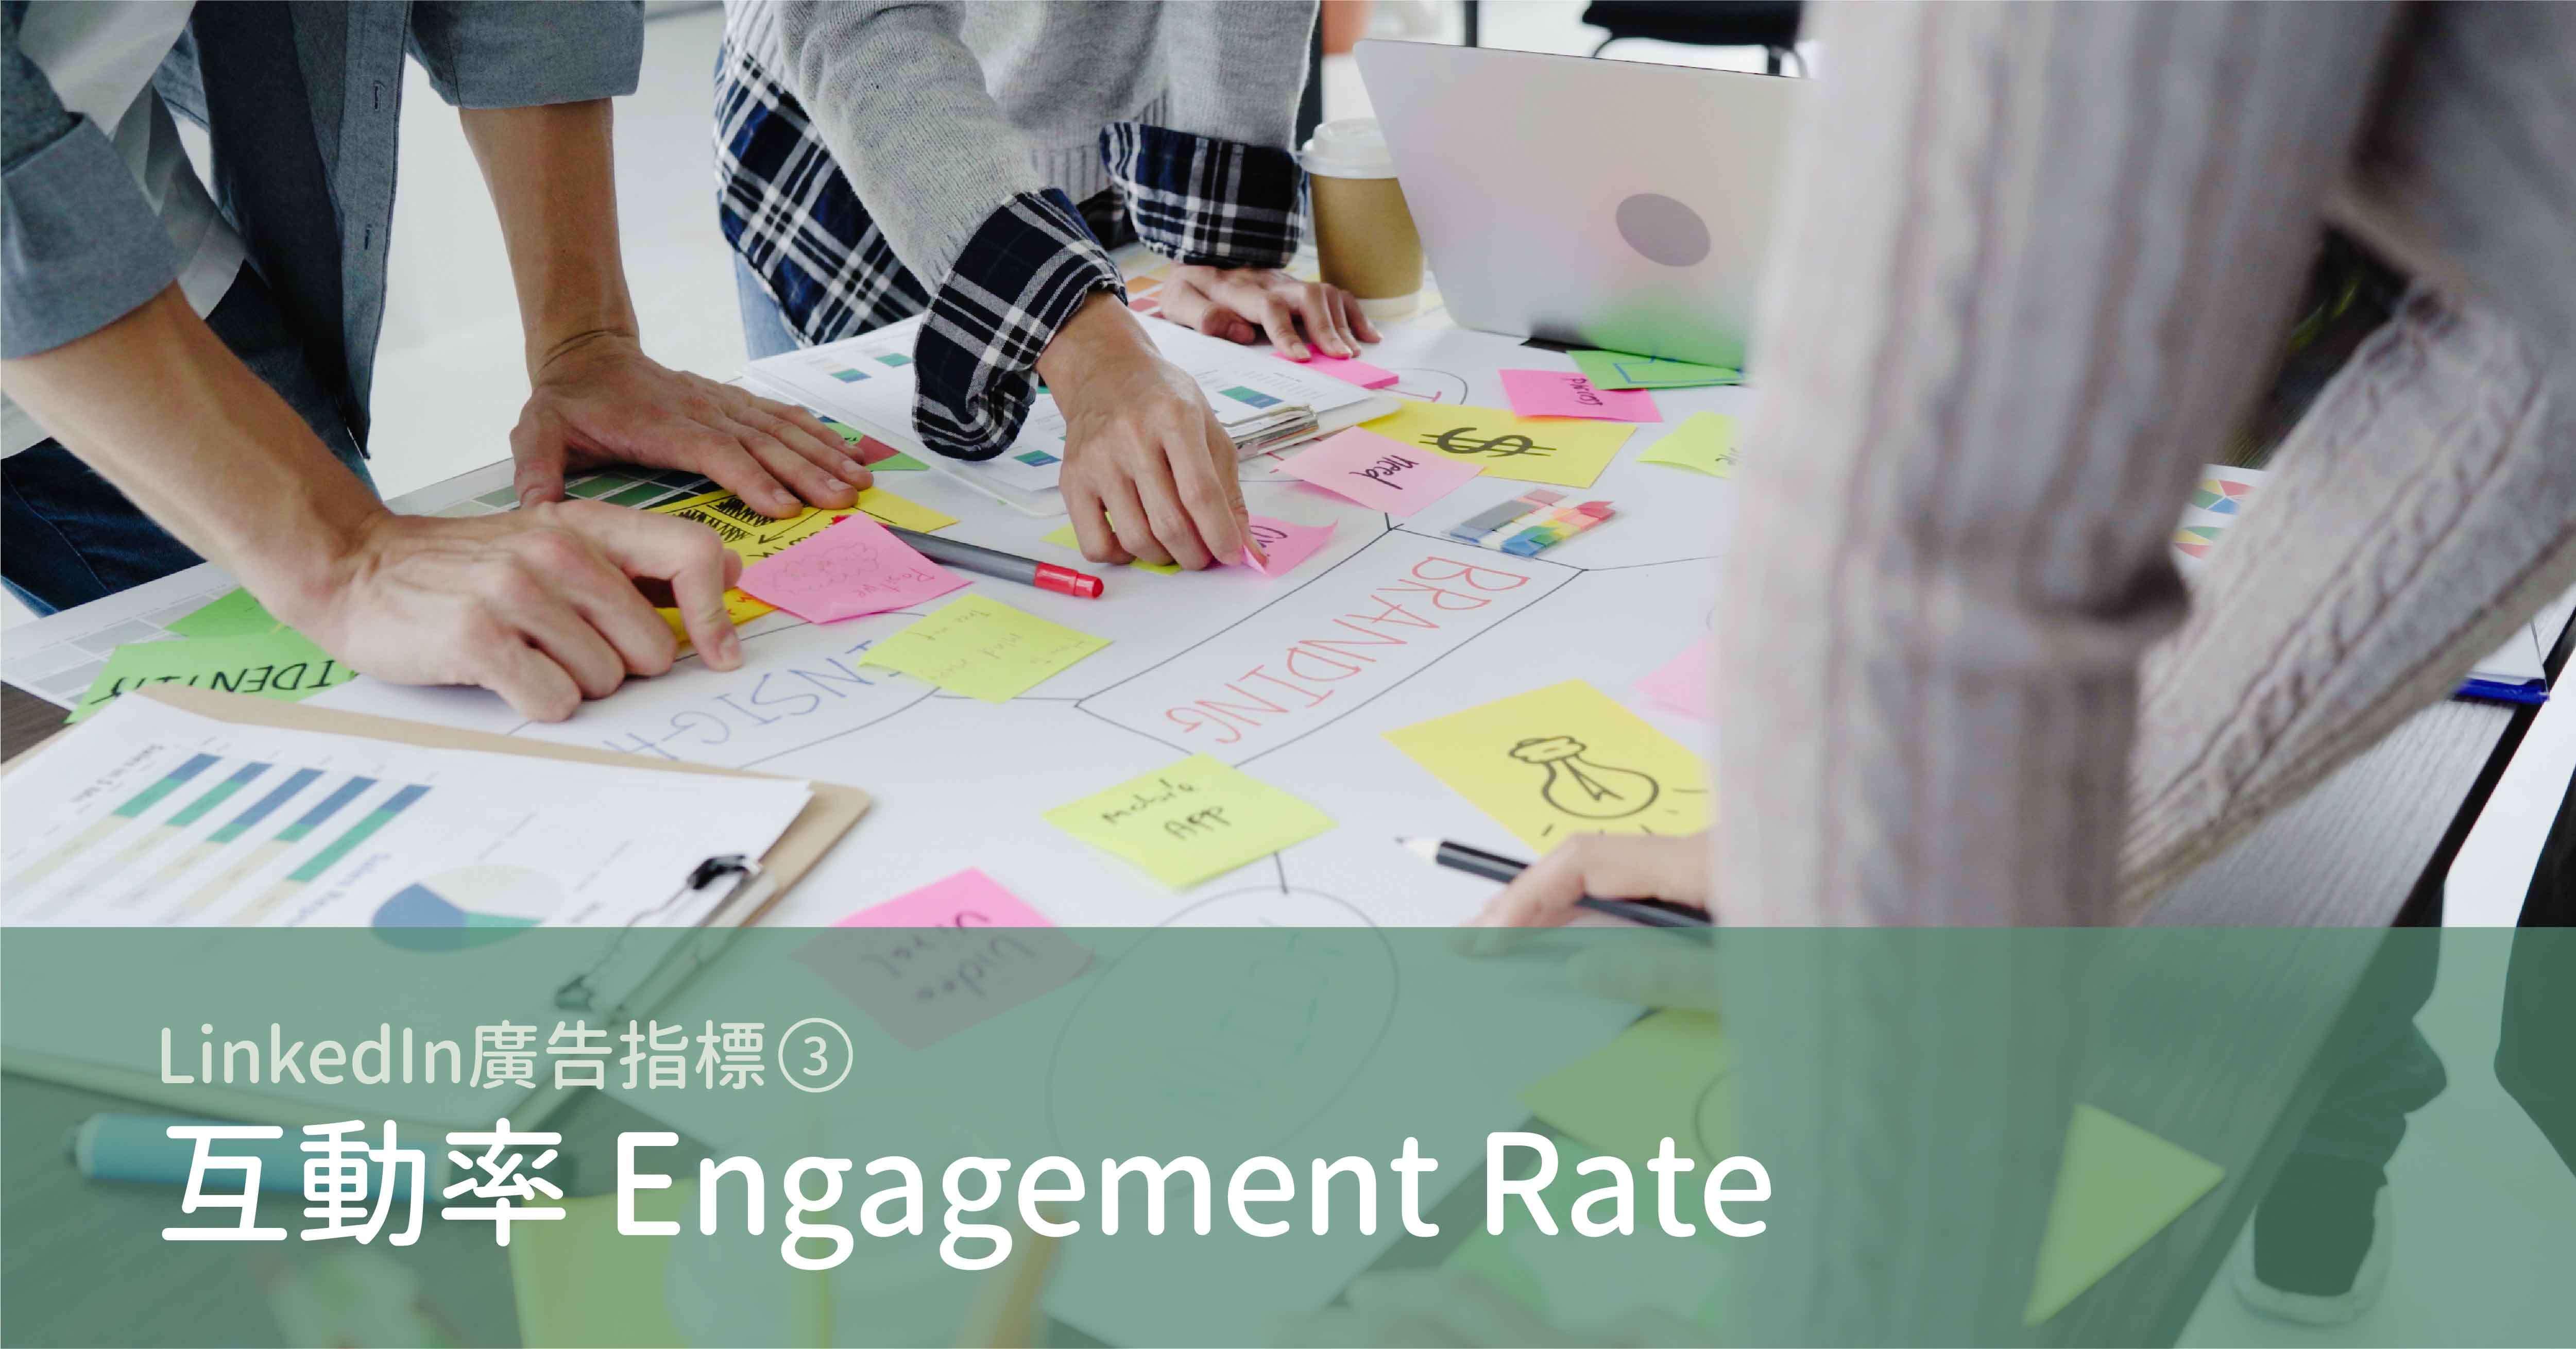 Linkedin Metrics engagement rate